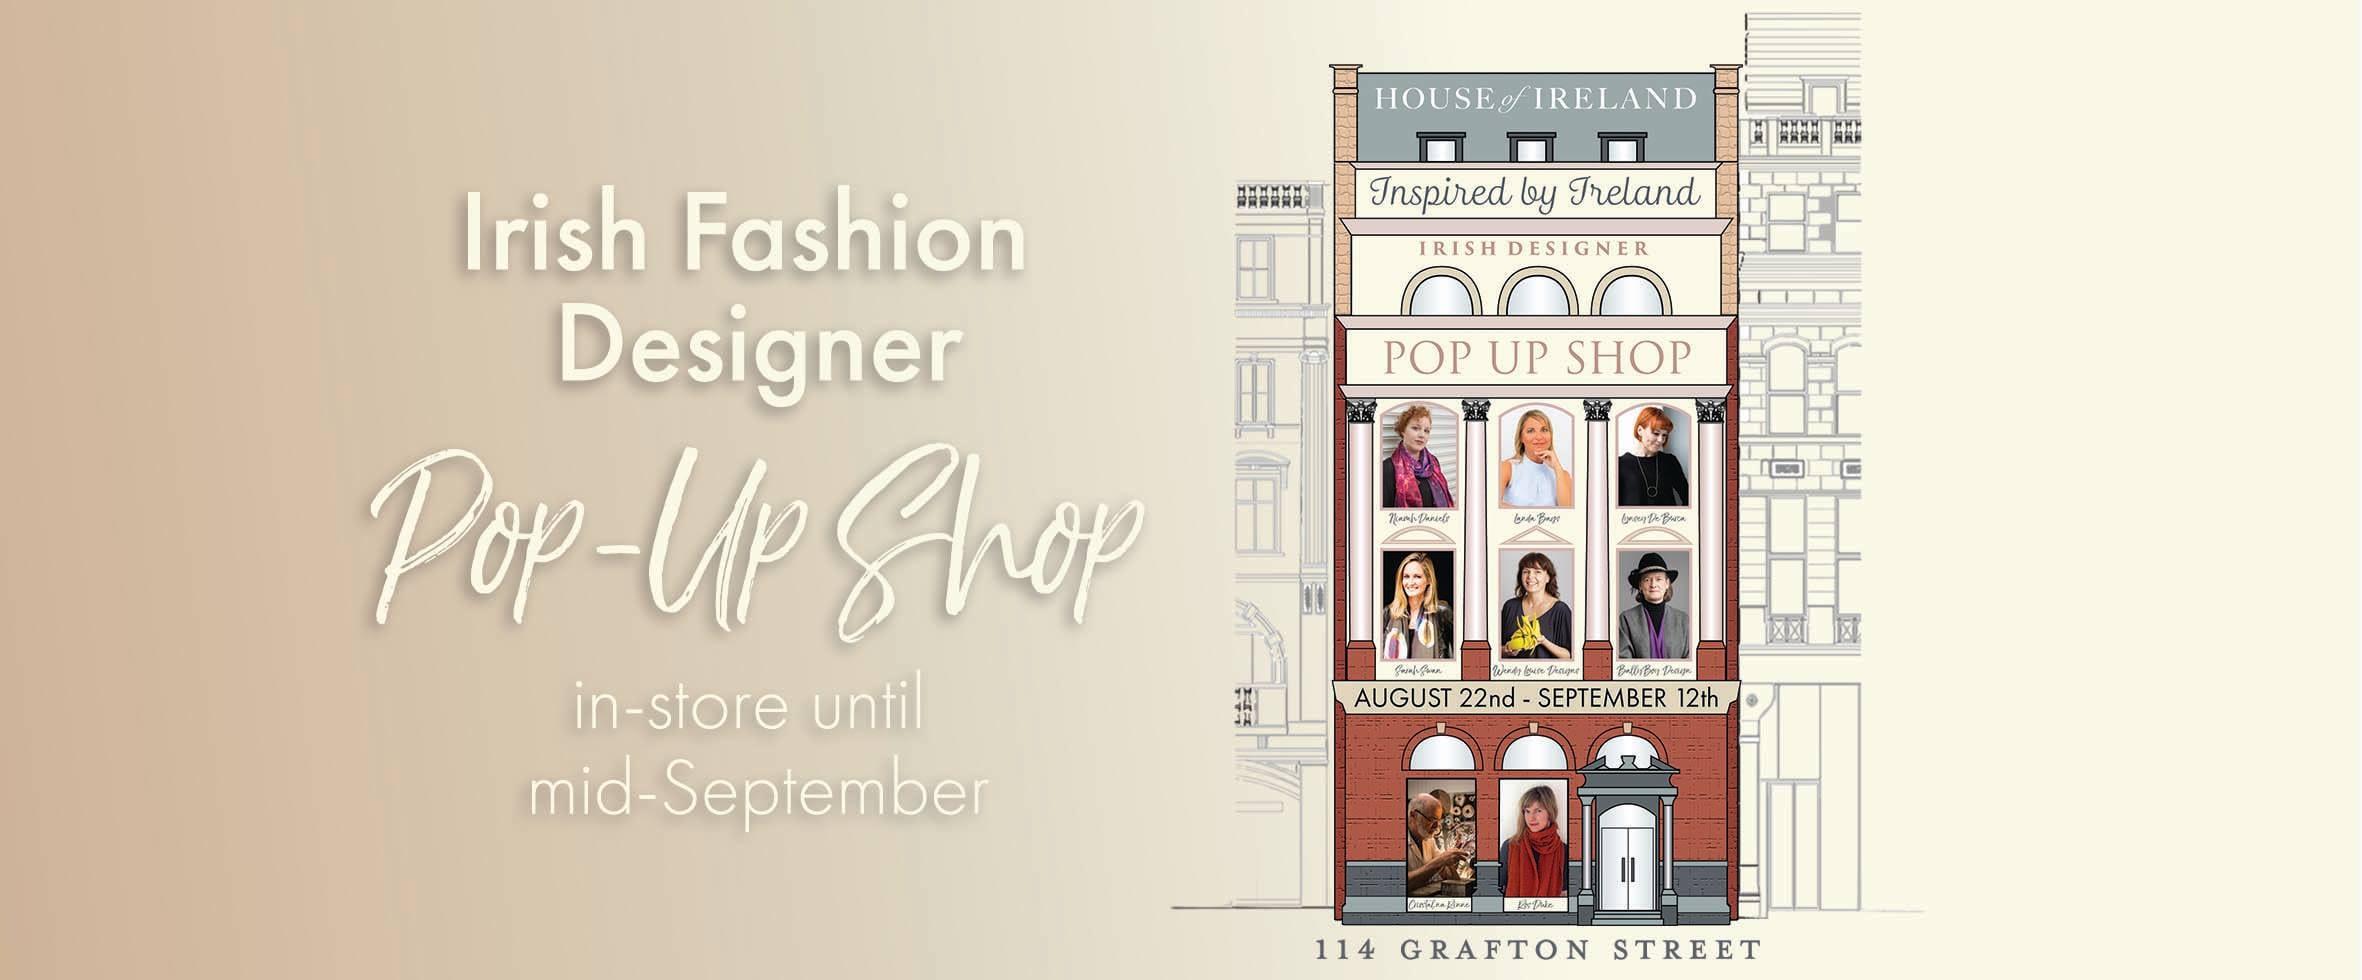 Irish Fashion Designers Pop Up Shop At House Of Ireland Dublintown